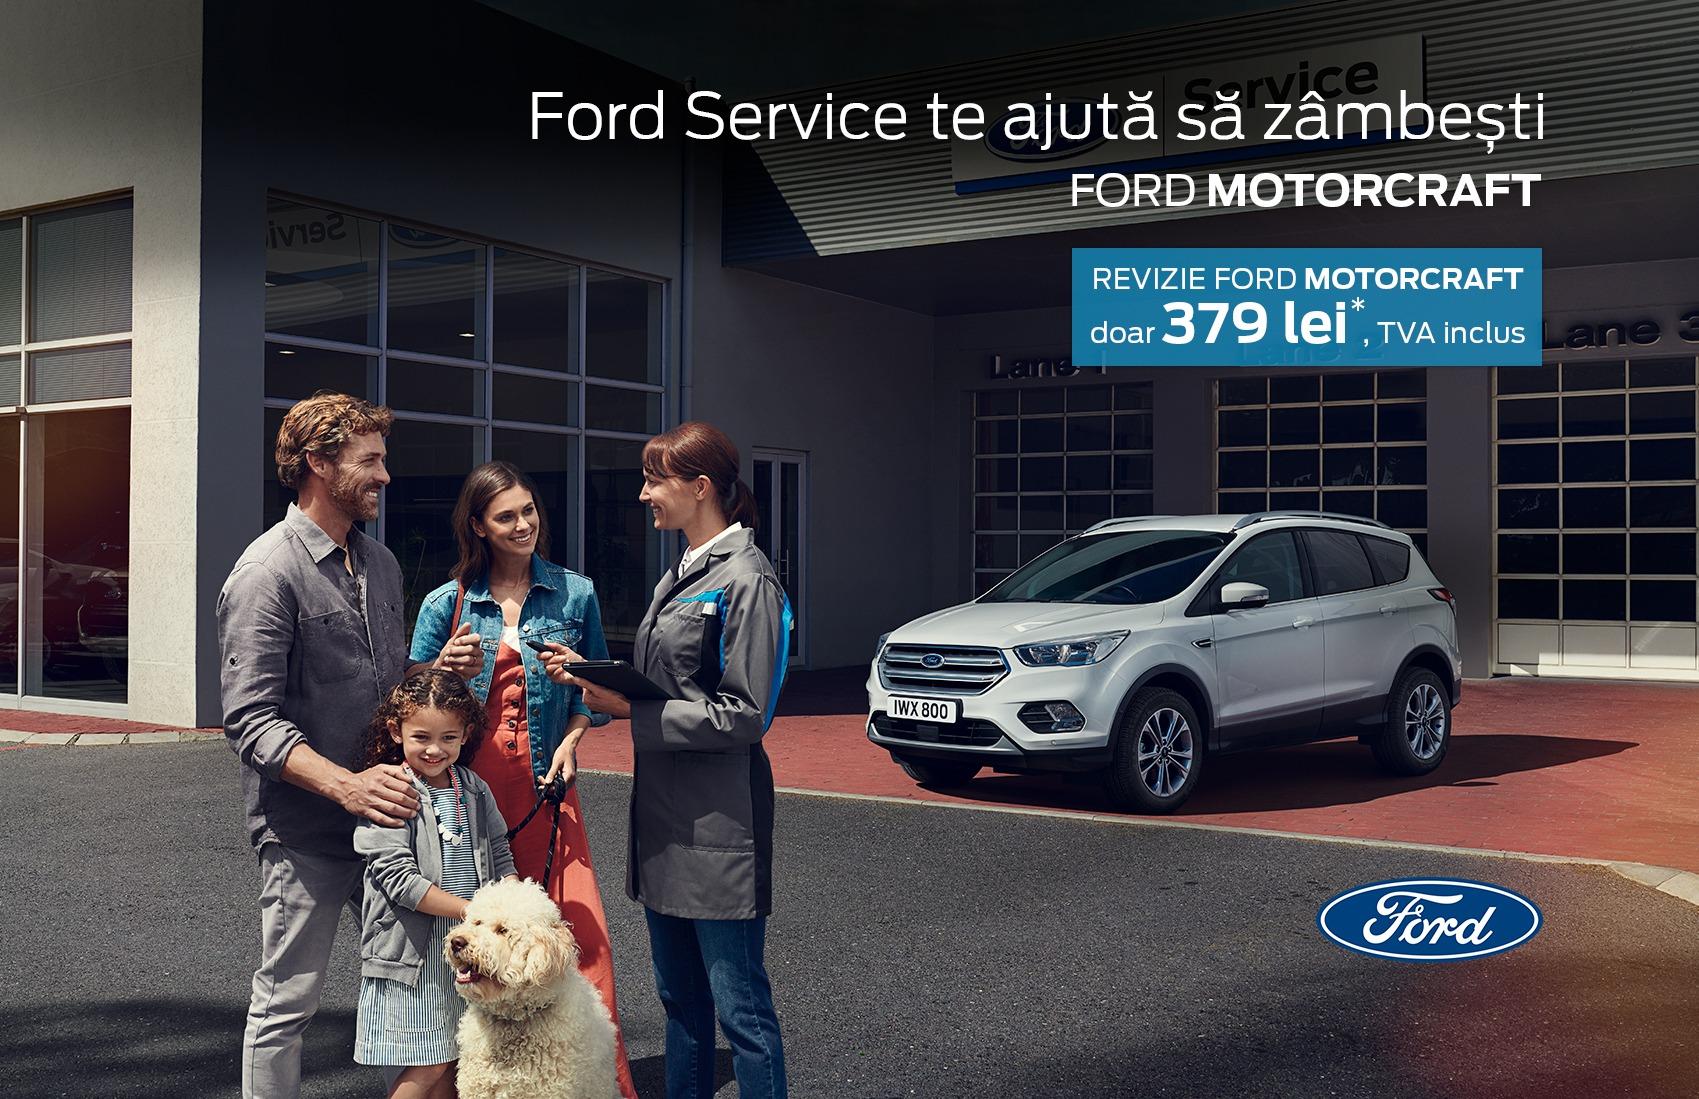 Revizie Ford Motorcraft, doar 379 lei, TVA inclus